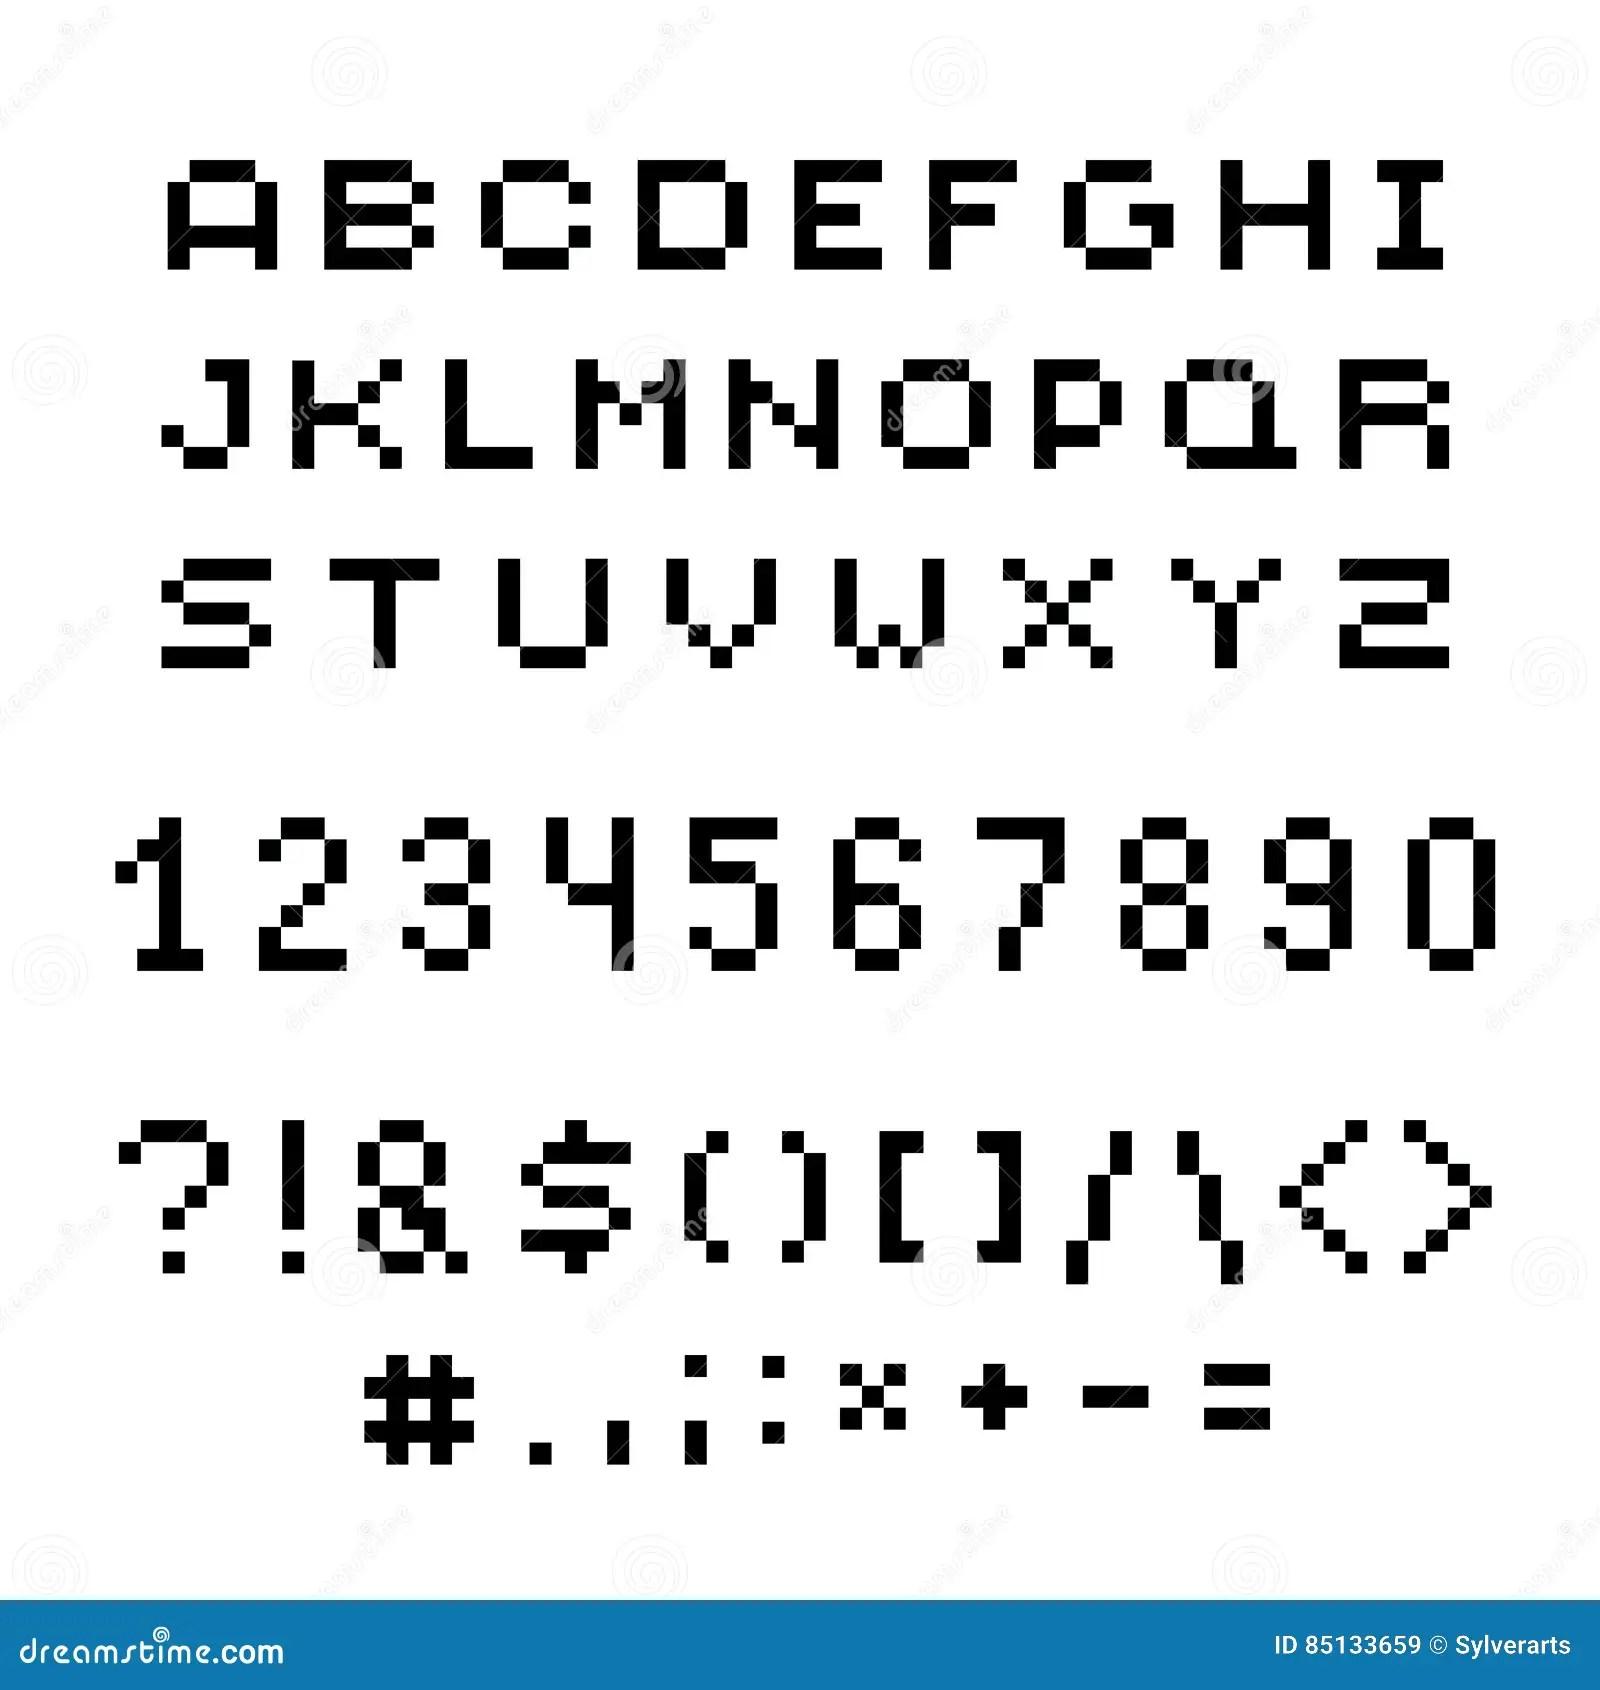 8 Bit Pixel Art